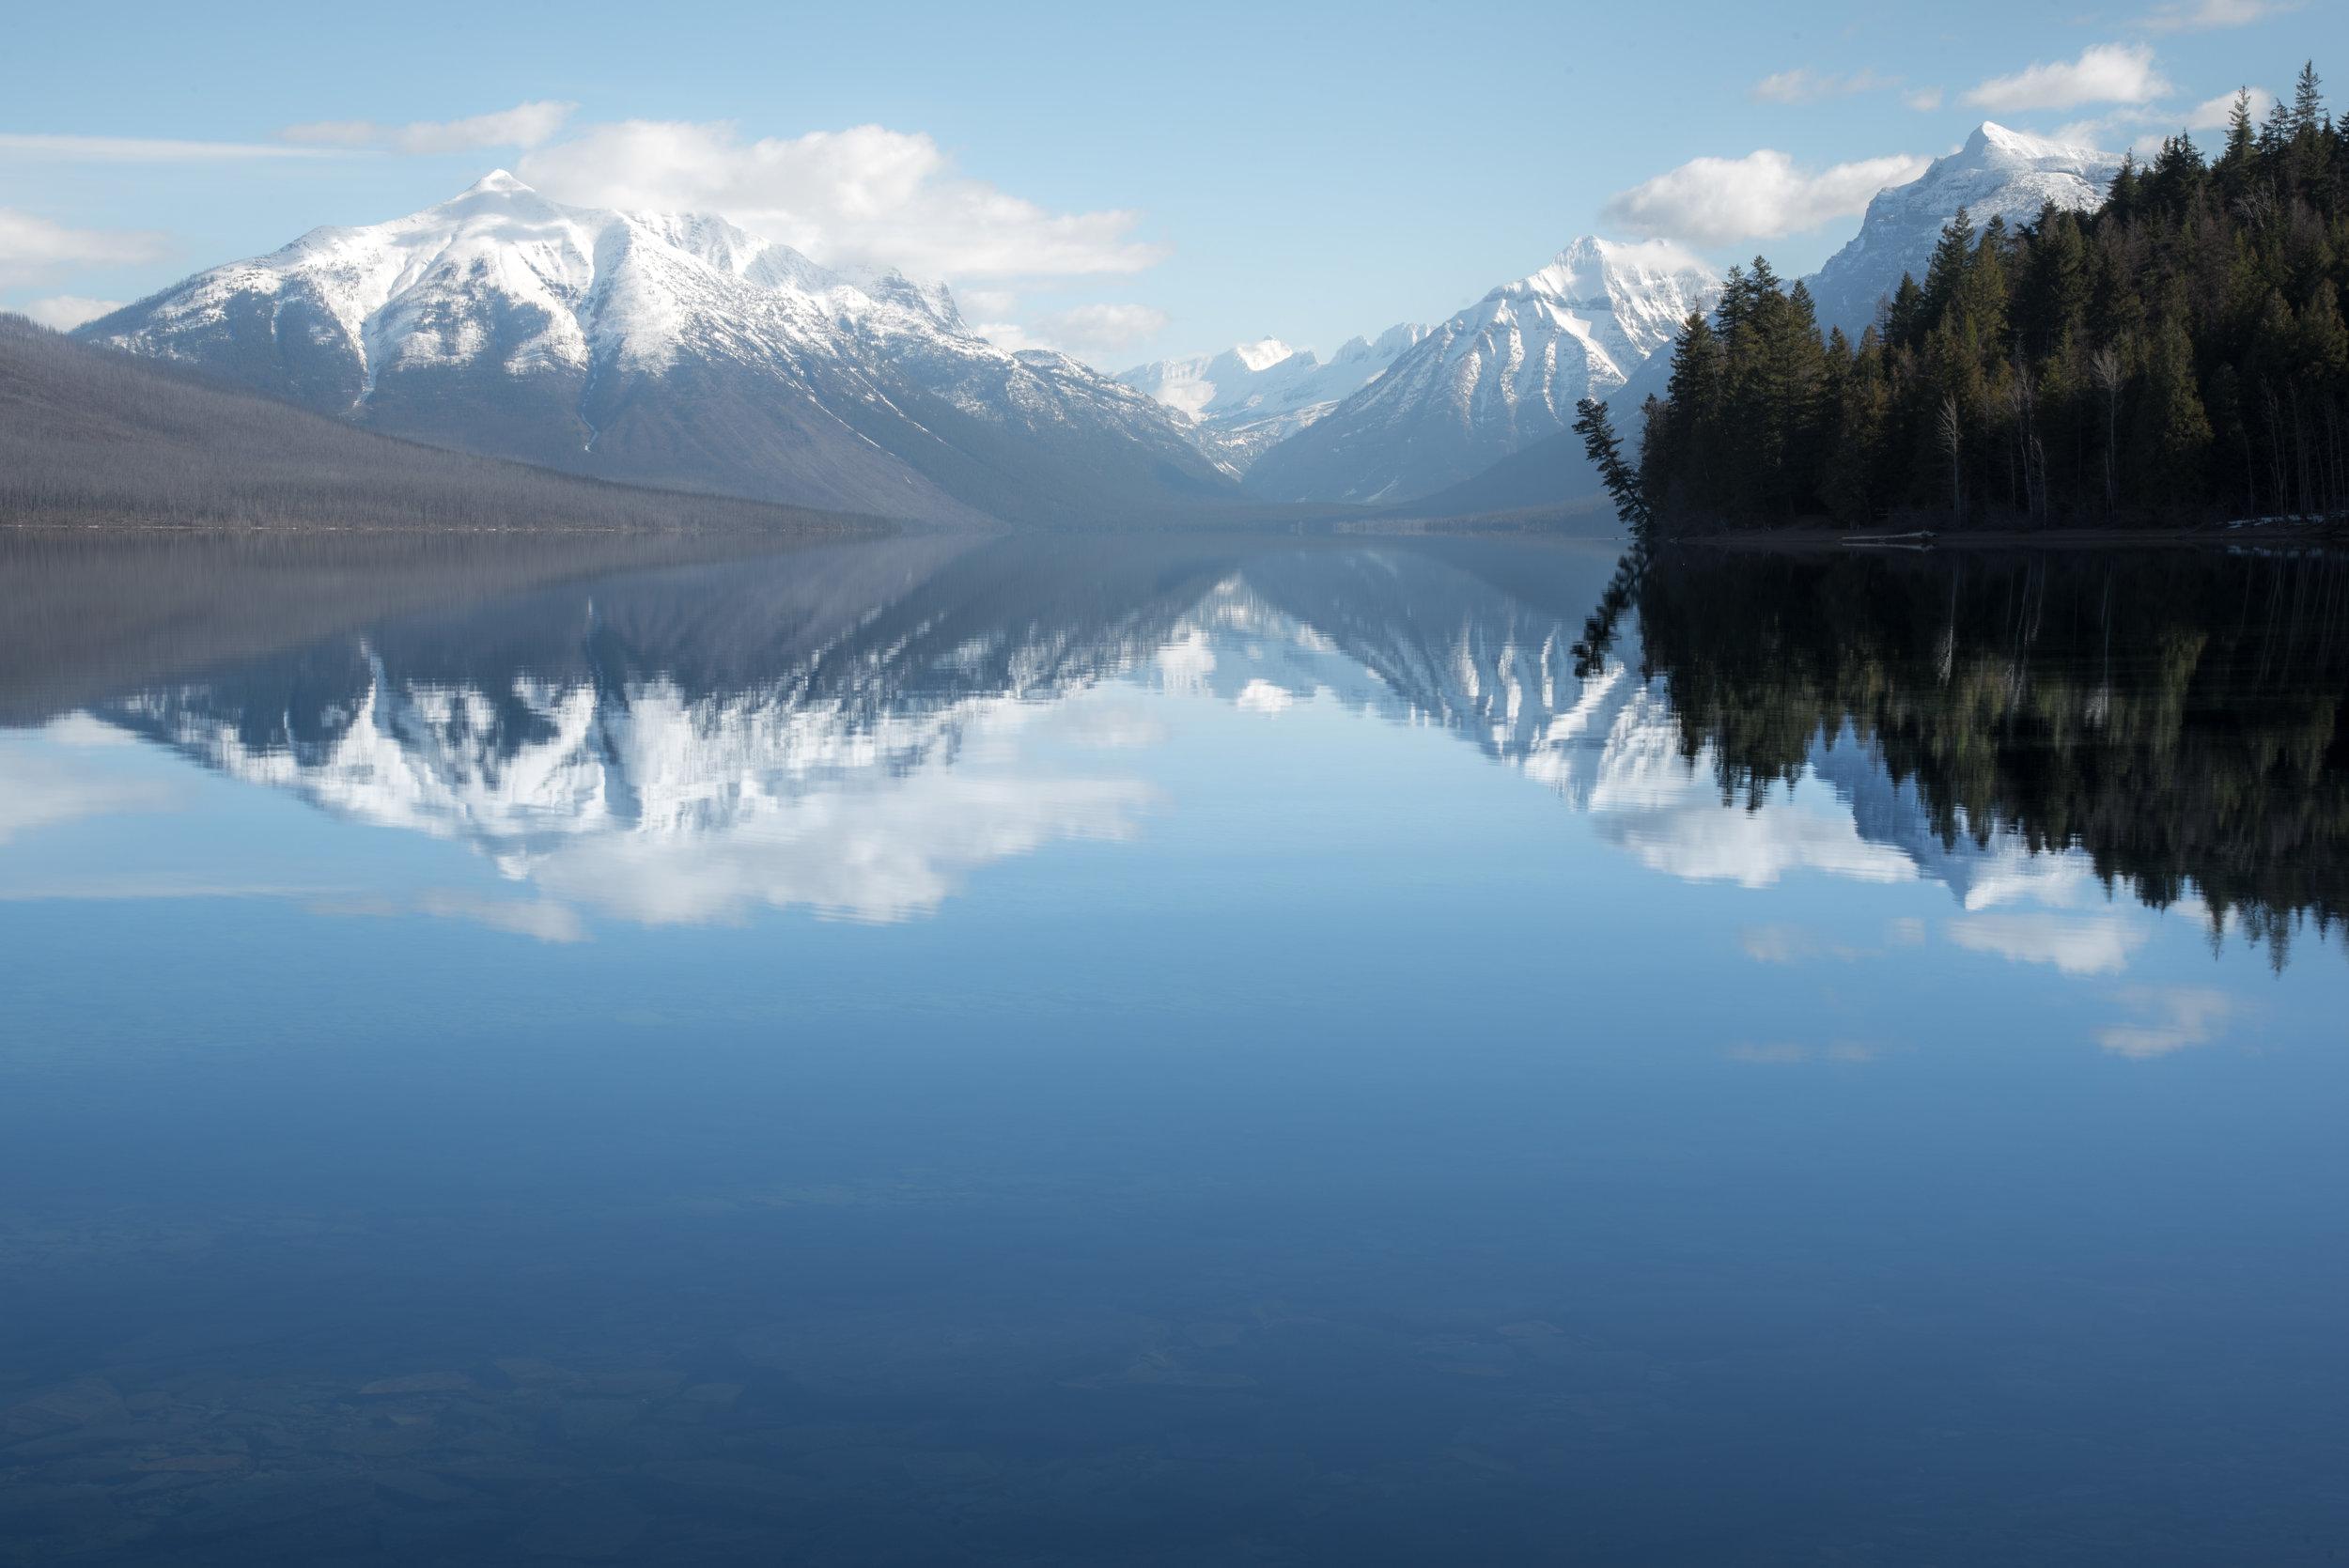 Lake McDonald Reflection